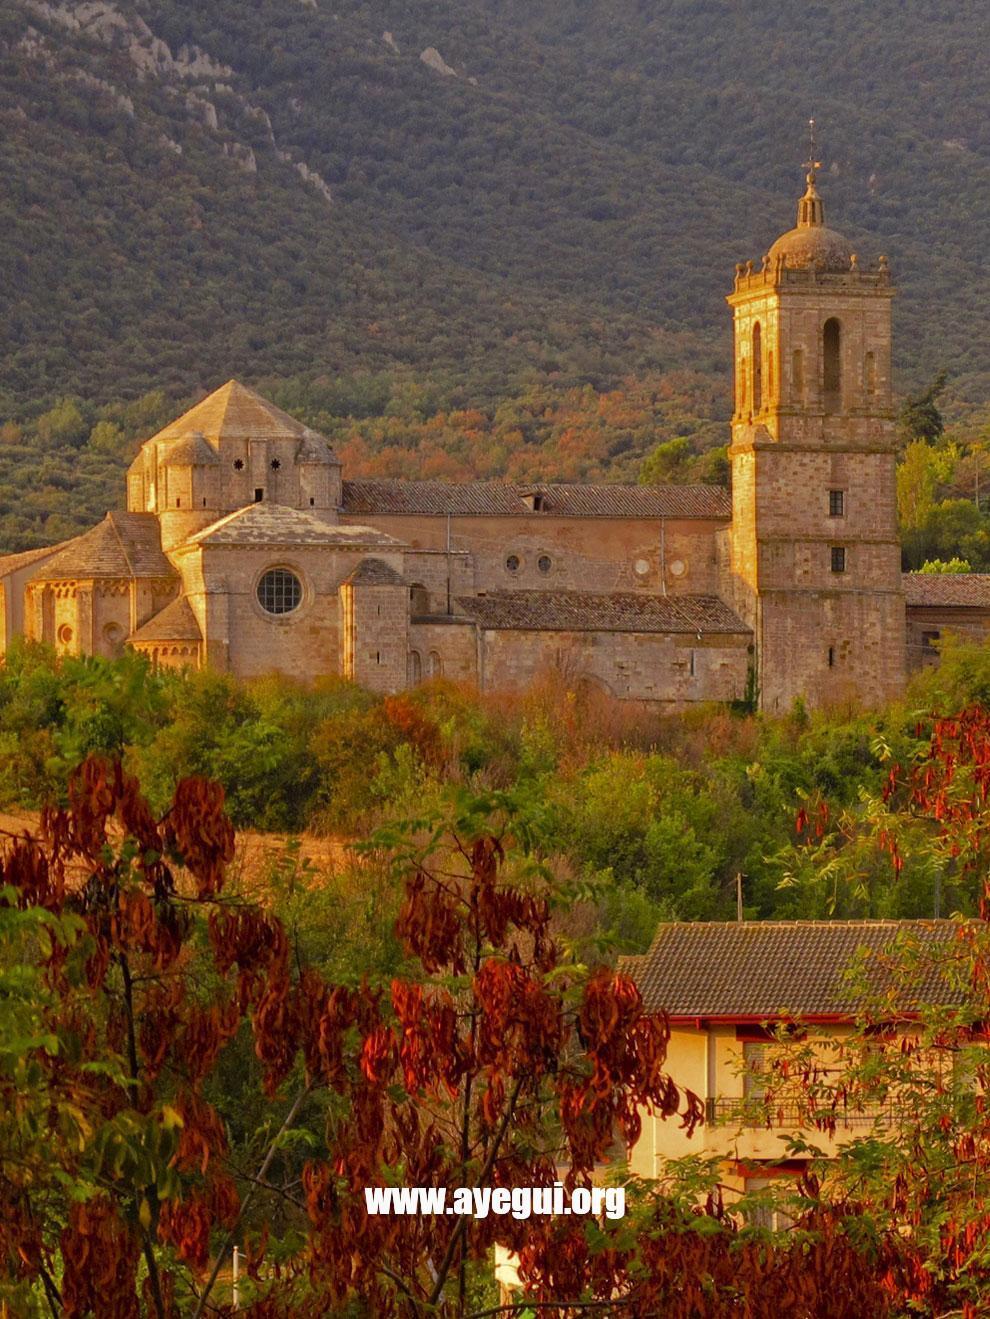 Monasterio de Irache. Patrimonio cultural. Ayegui Turismo